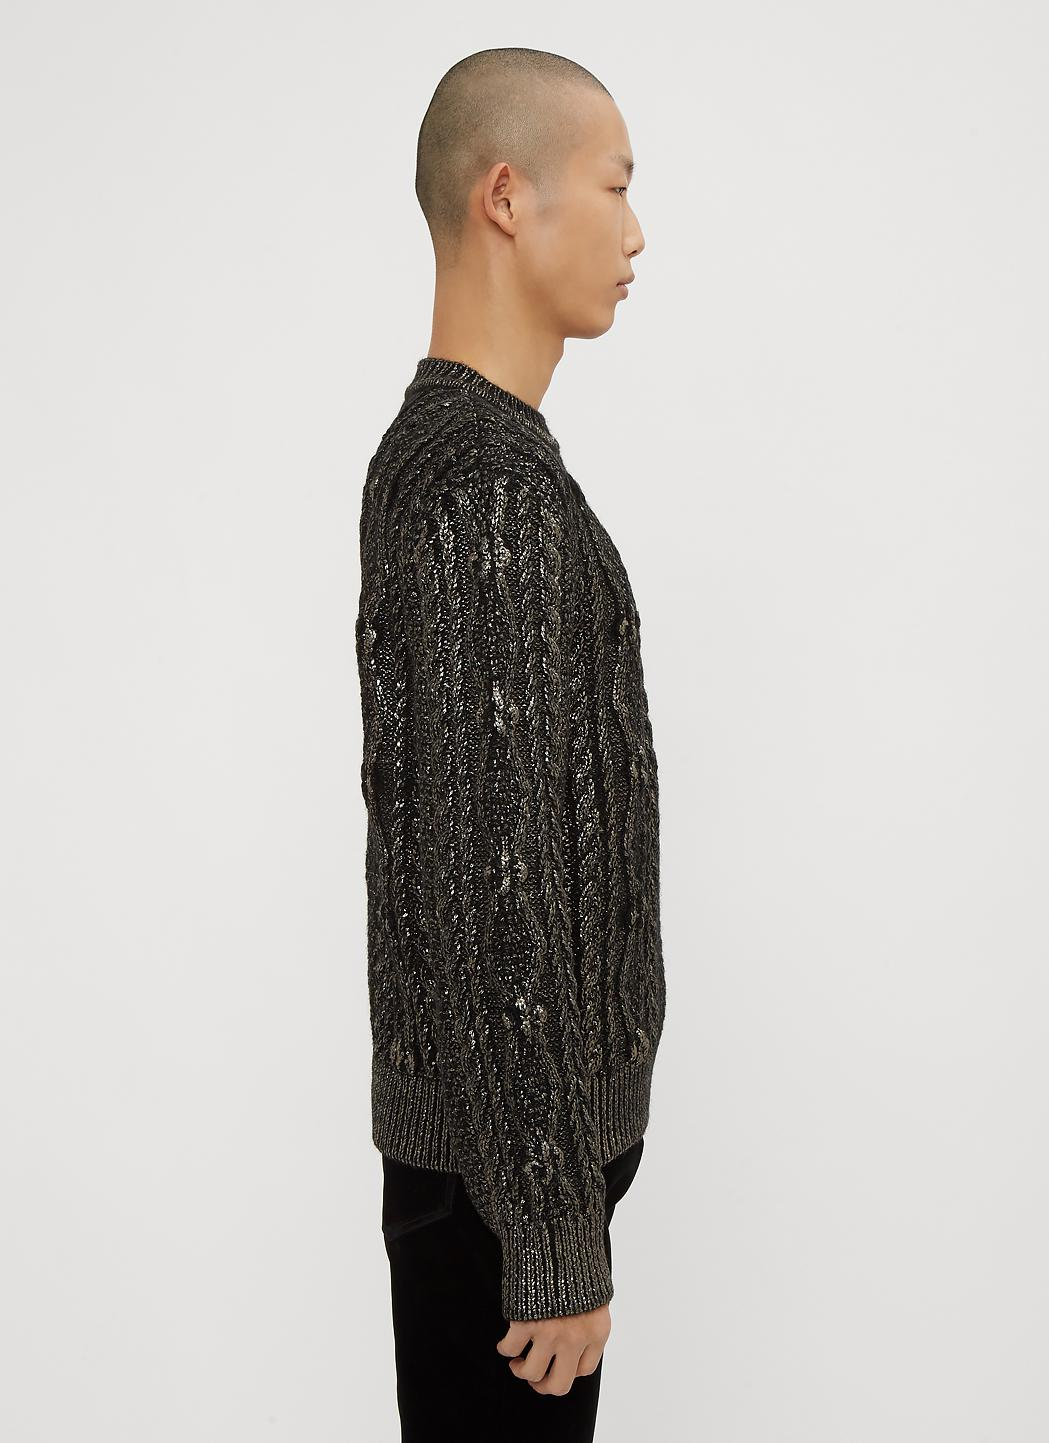 Saint Laurent Wool Lamé Aran Knit Sweater In Black for Men ...